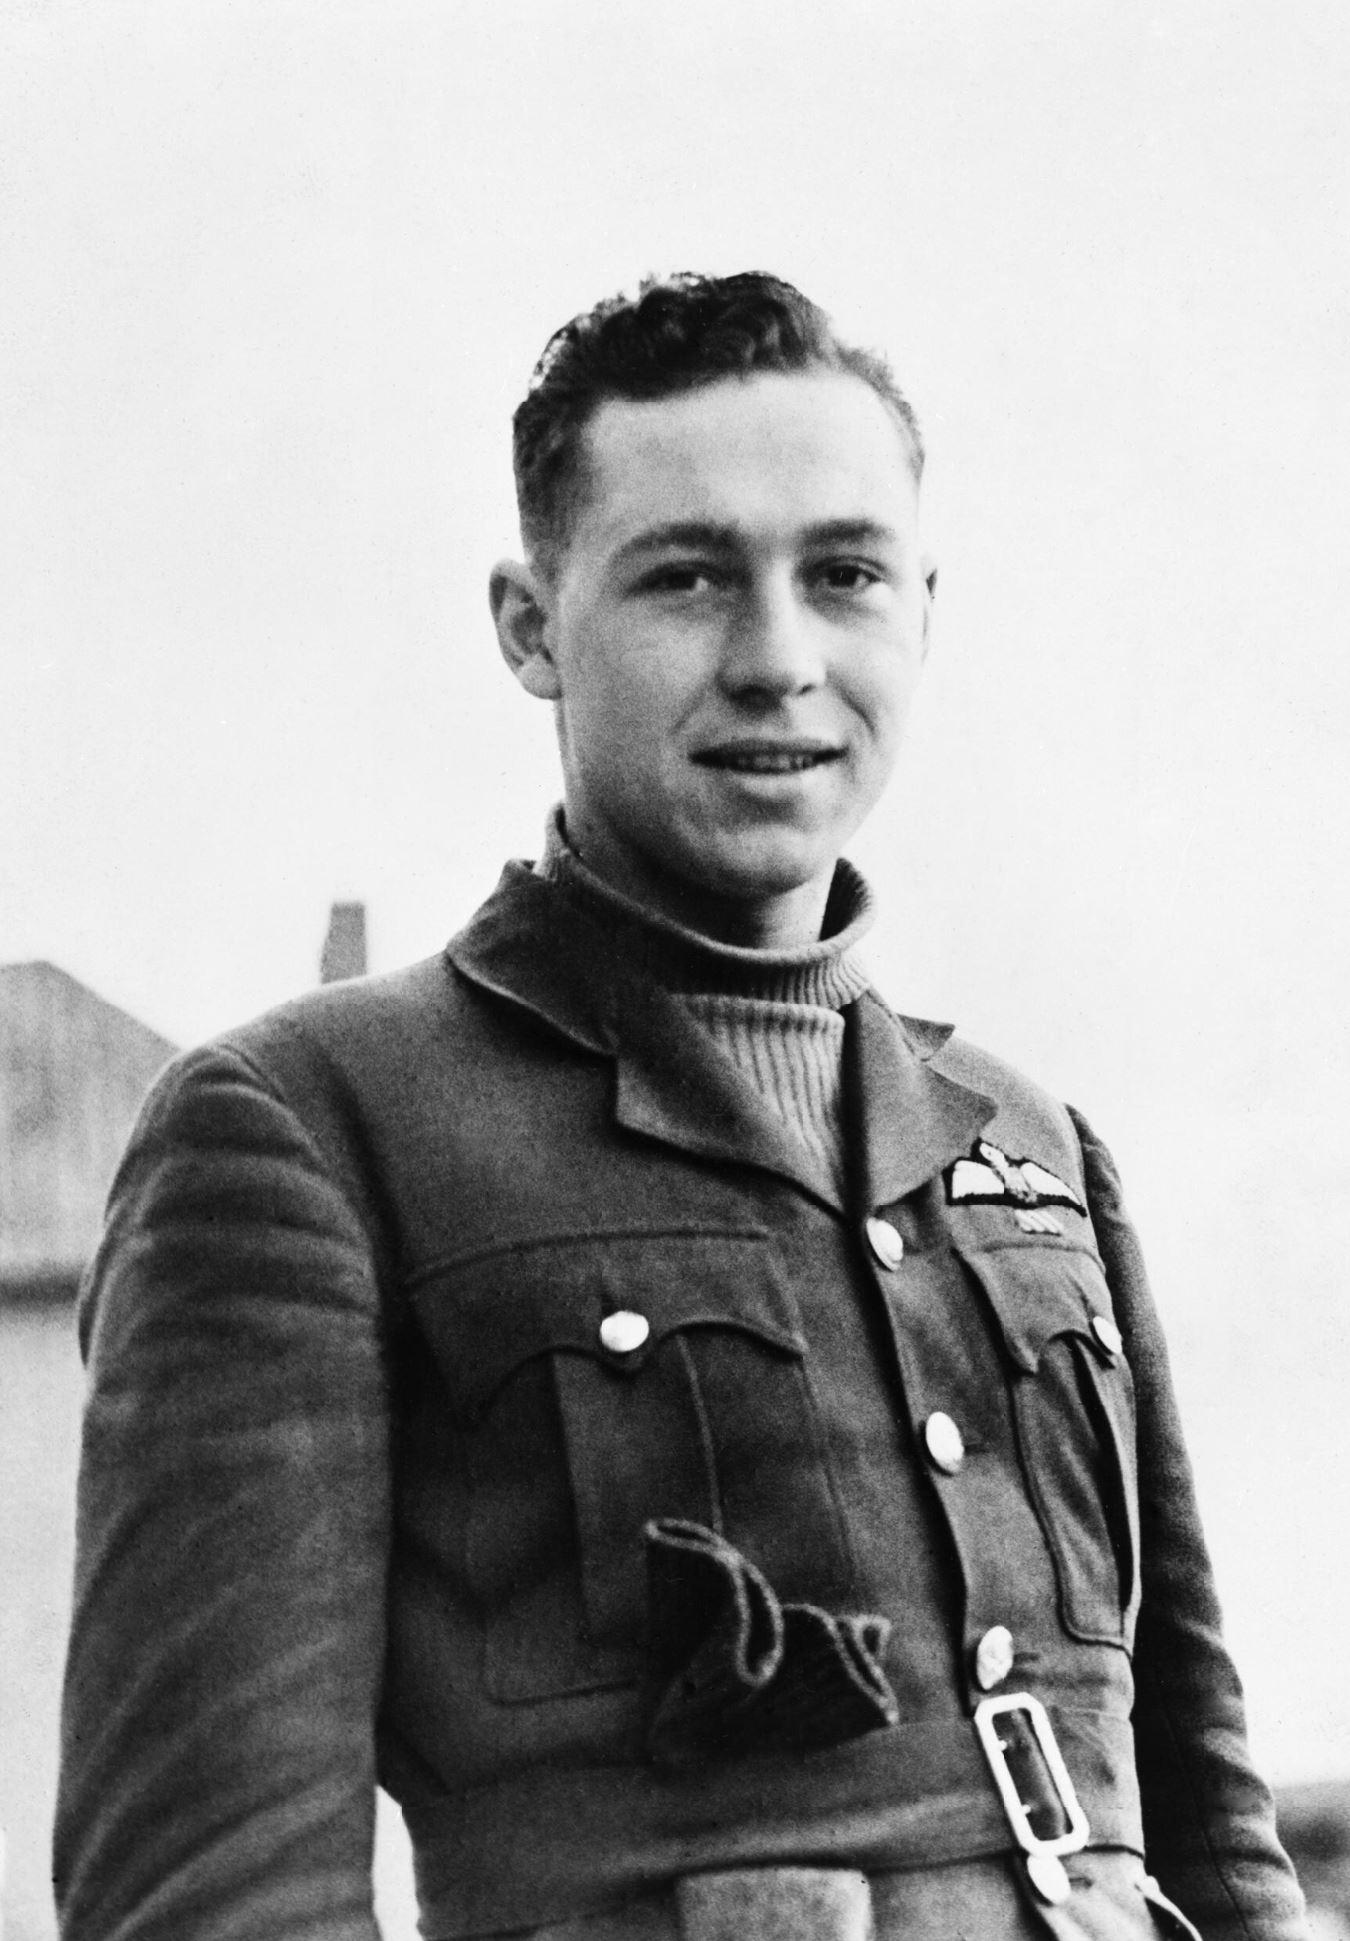 Aircrew RAF 242Sqn William Willie McKnight Sep 1940 IWM CH1321